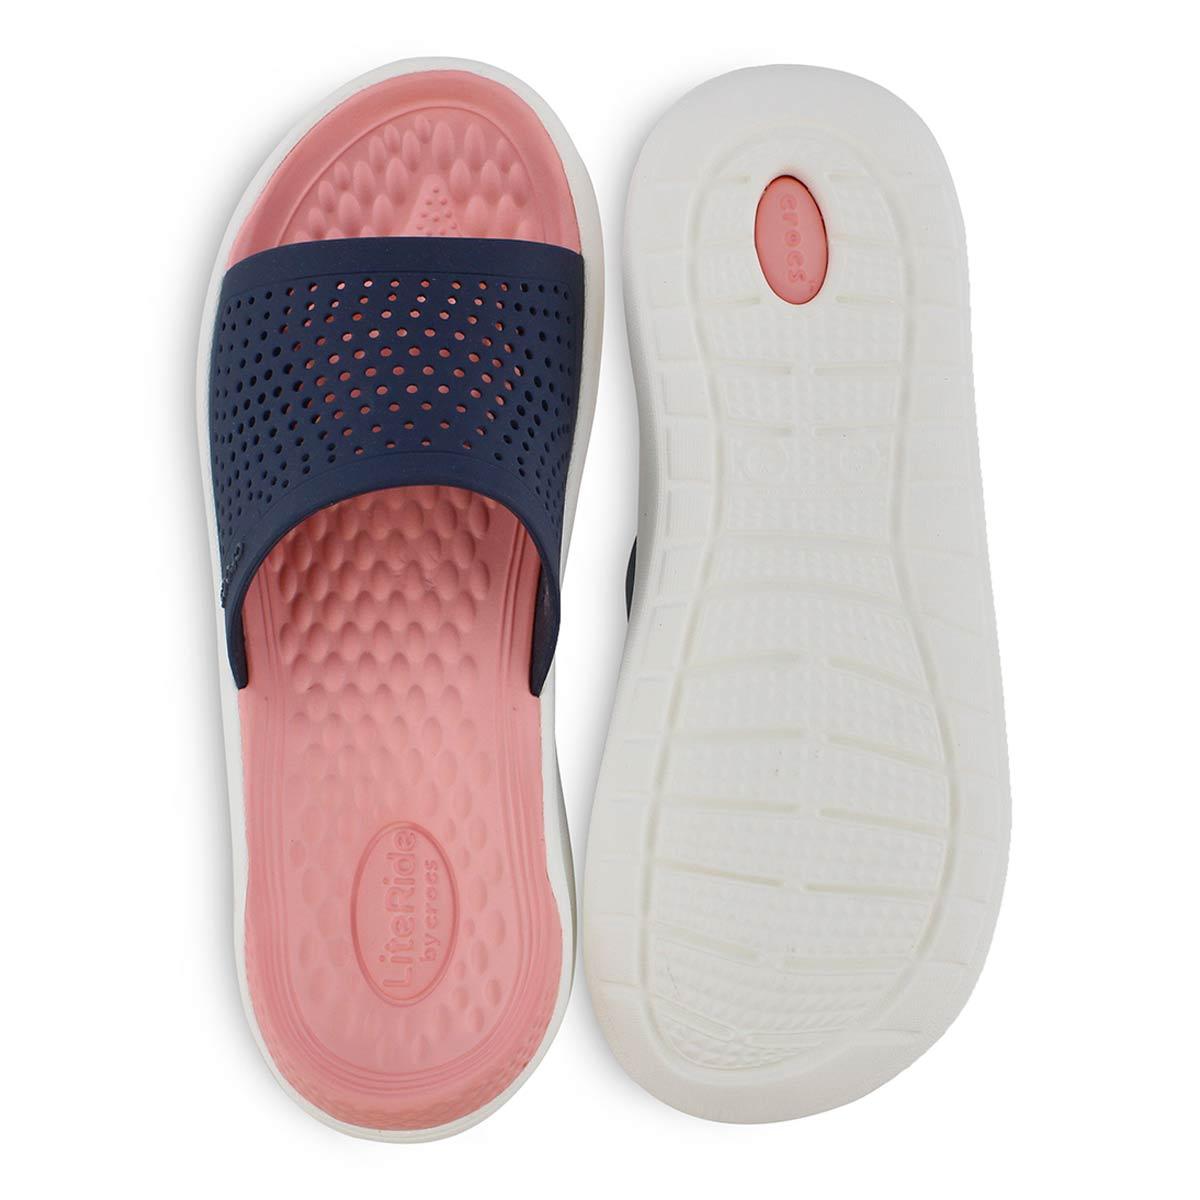 Sandale LITERIDE SLIDE,bl mrn/melon,fem